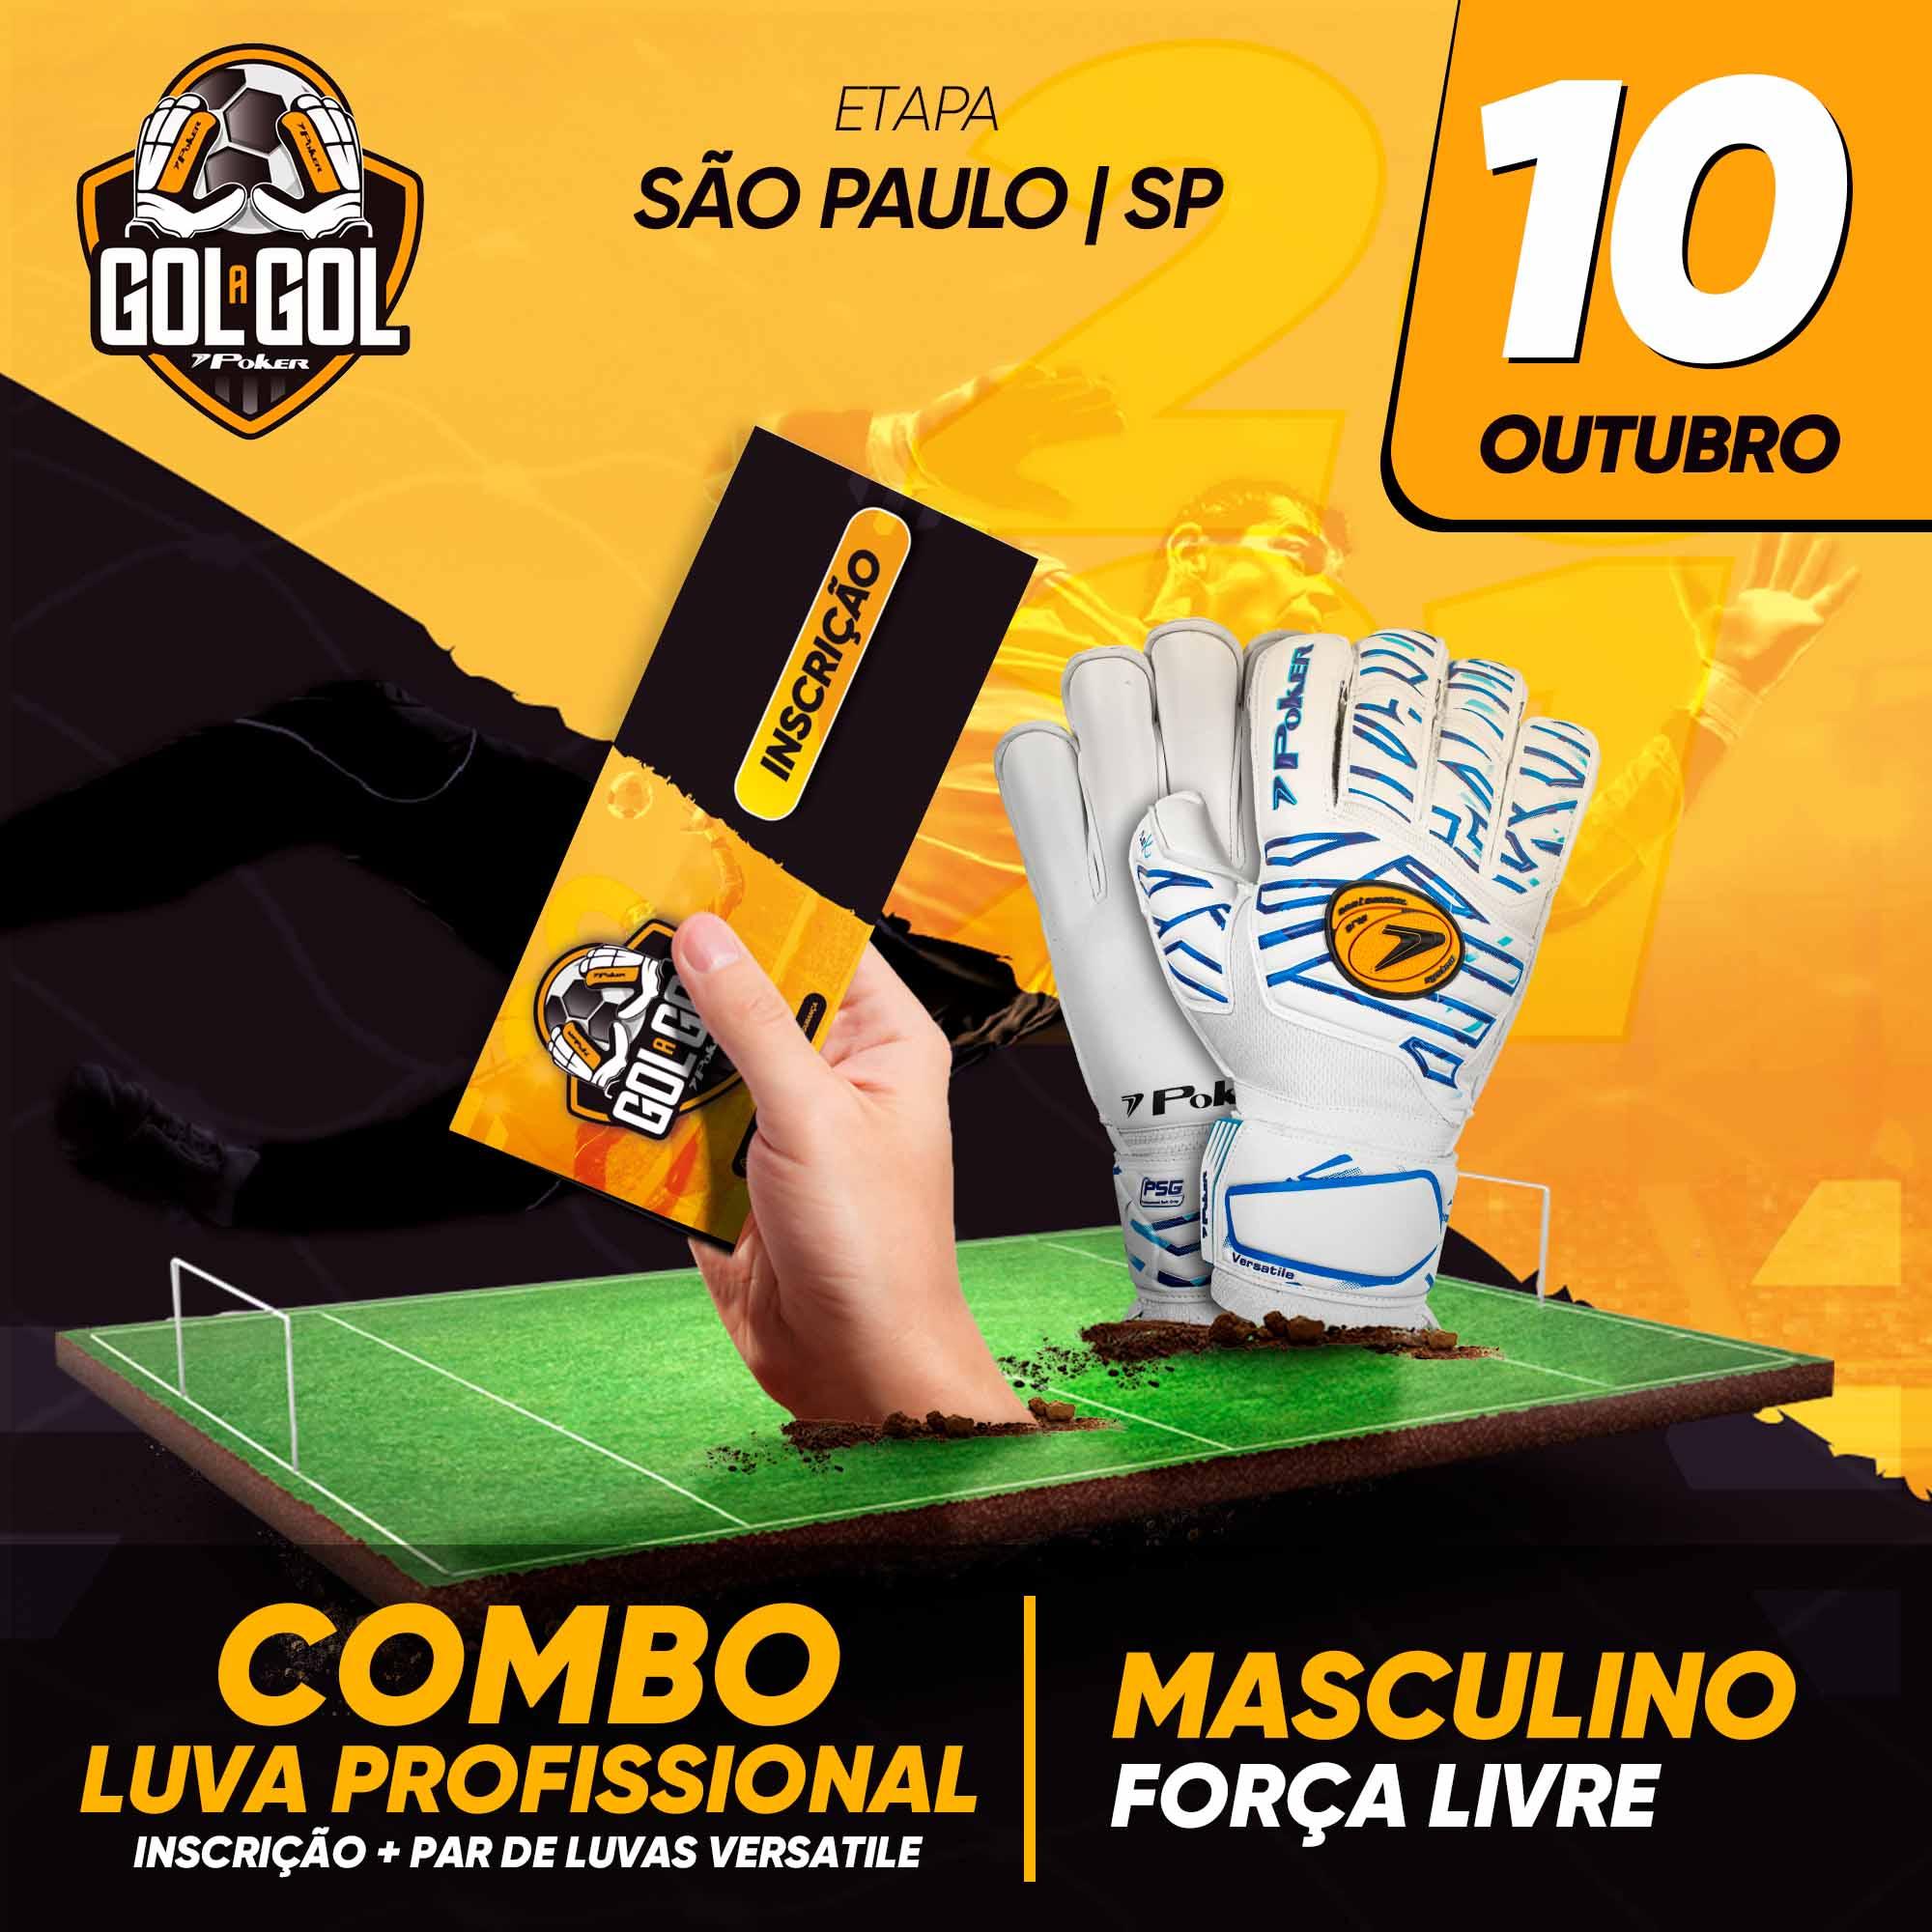 Combo Luva Profissional   Gol a Gol São Paulo/SP  10/10/2021